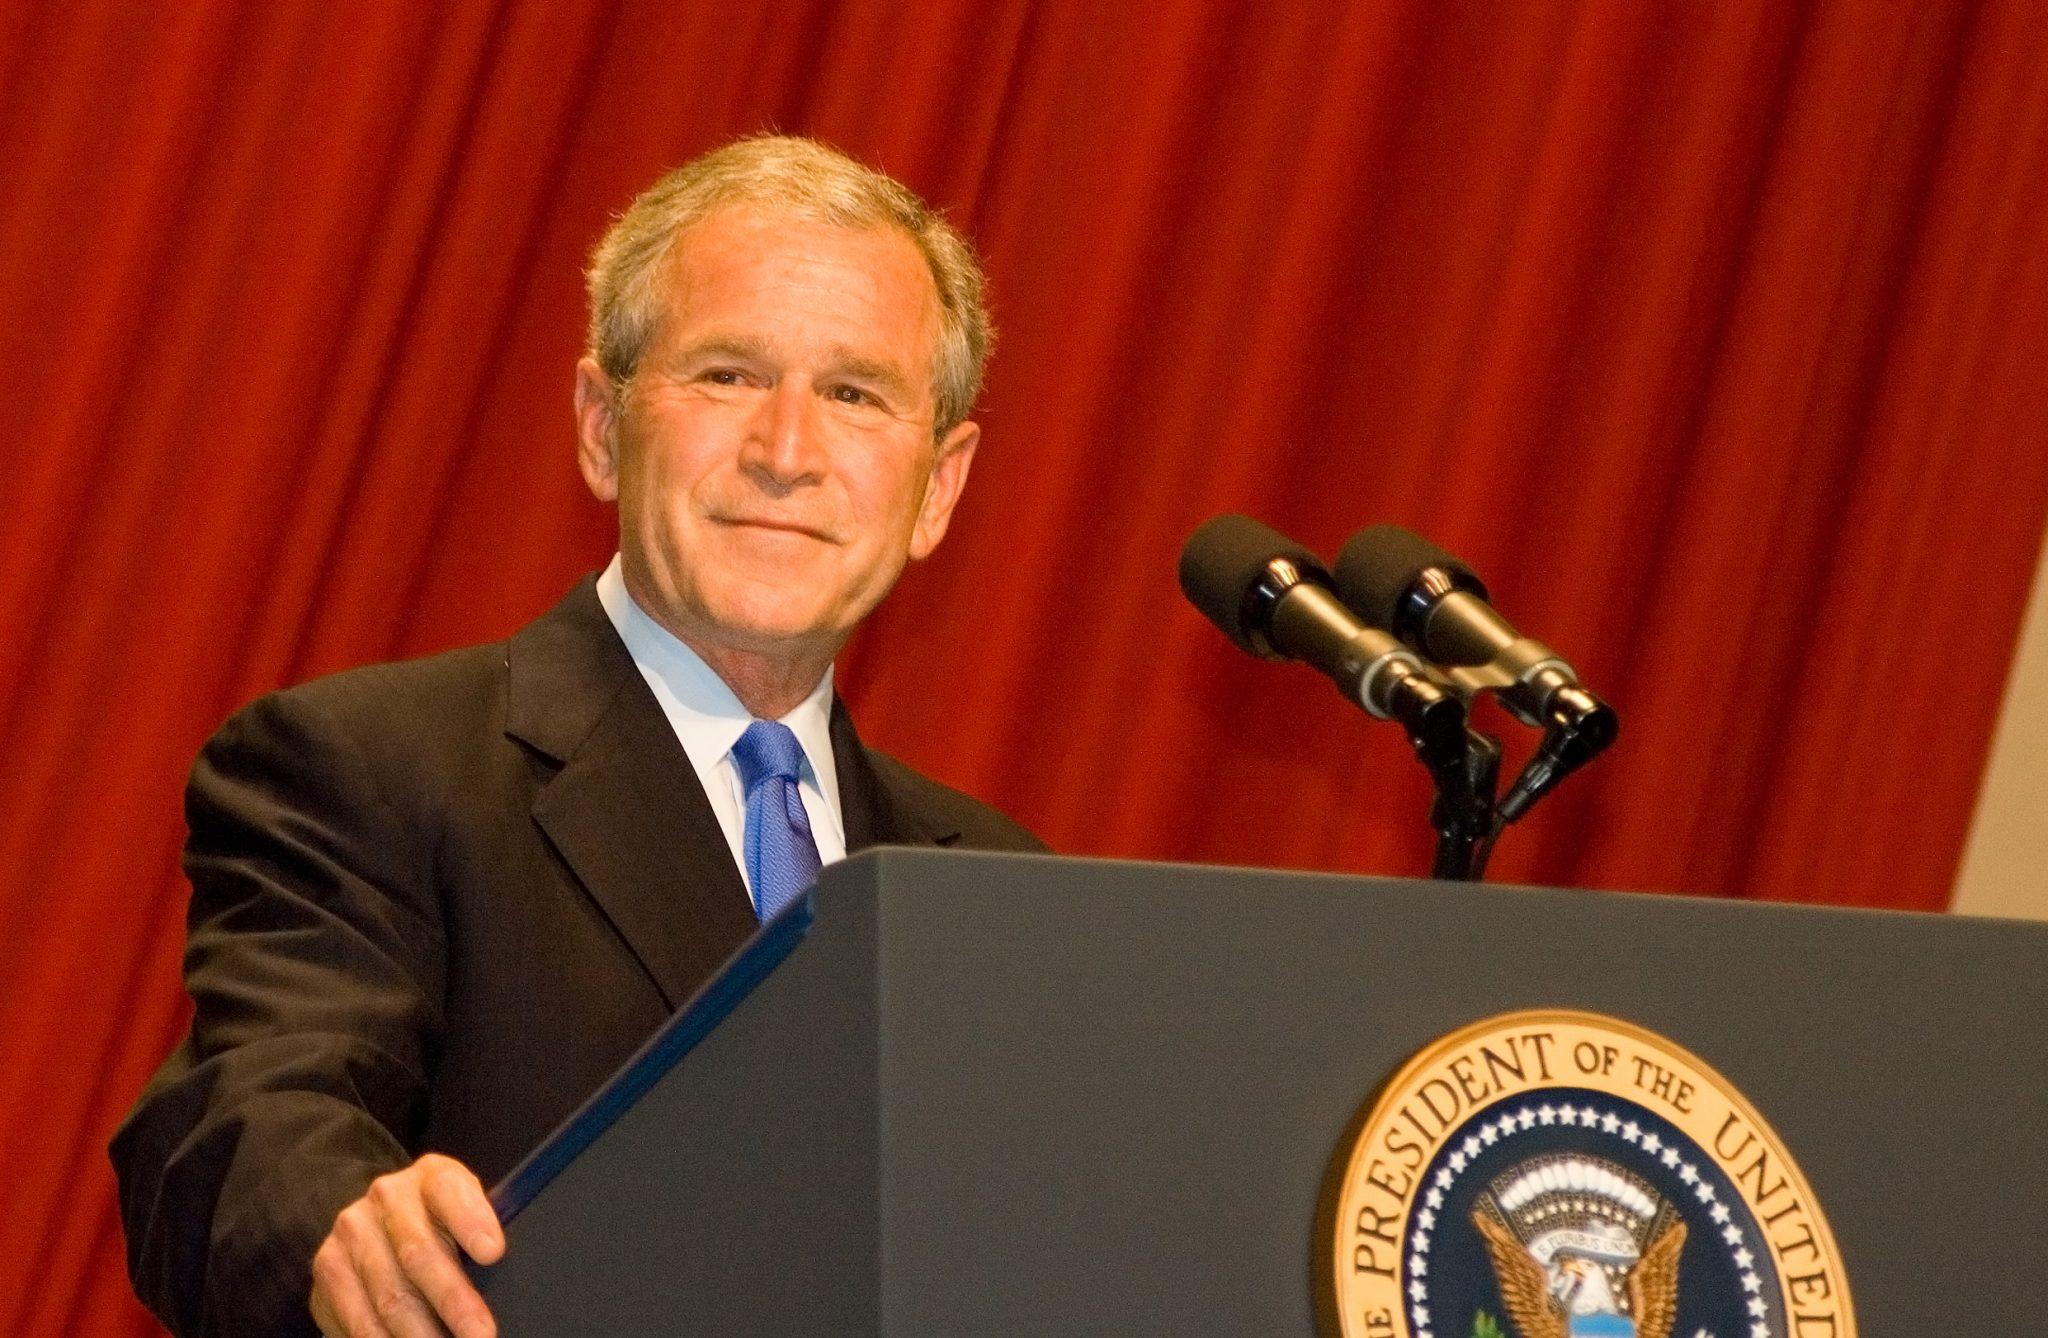 Dear President Bush — Please Endorse Donald Trump   The American Spectator   USA News and PoliticsThe American Spectator   USA News and Politics